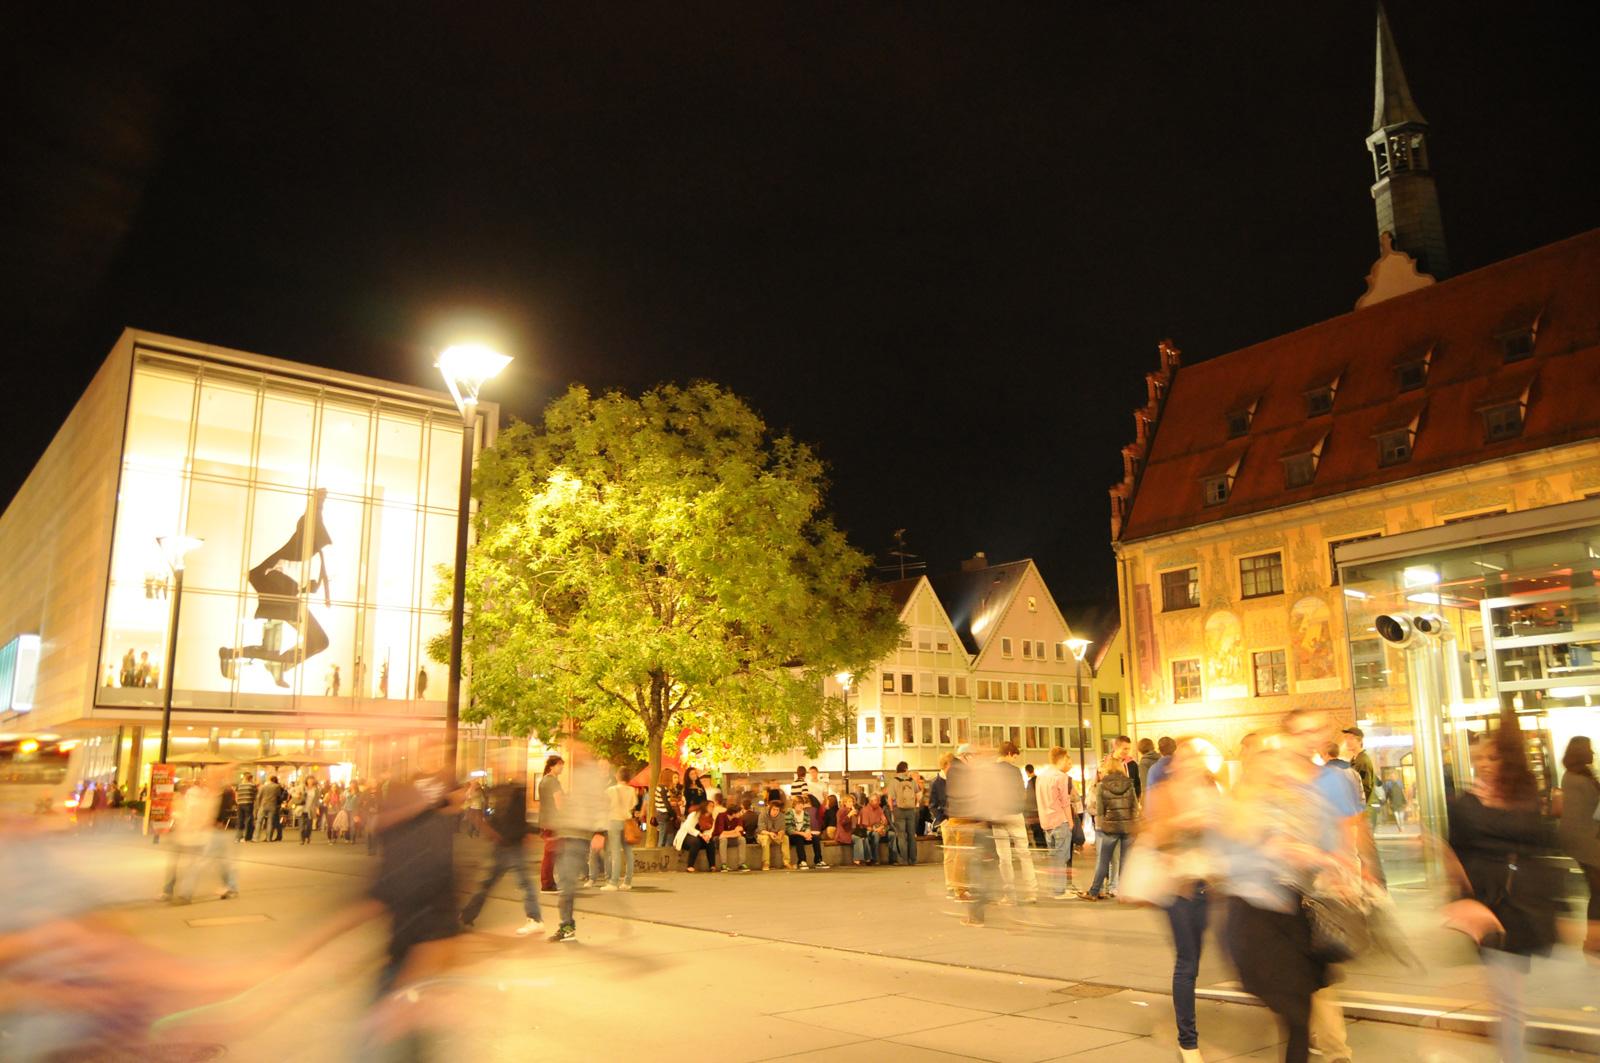 Fotografie: Ulm ©Gabriele Stautner, ARTIFOX